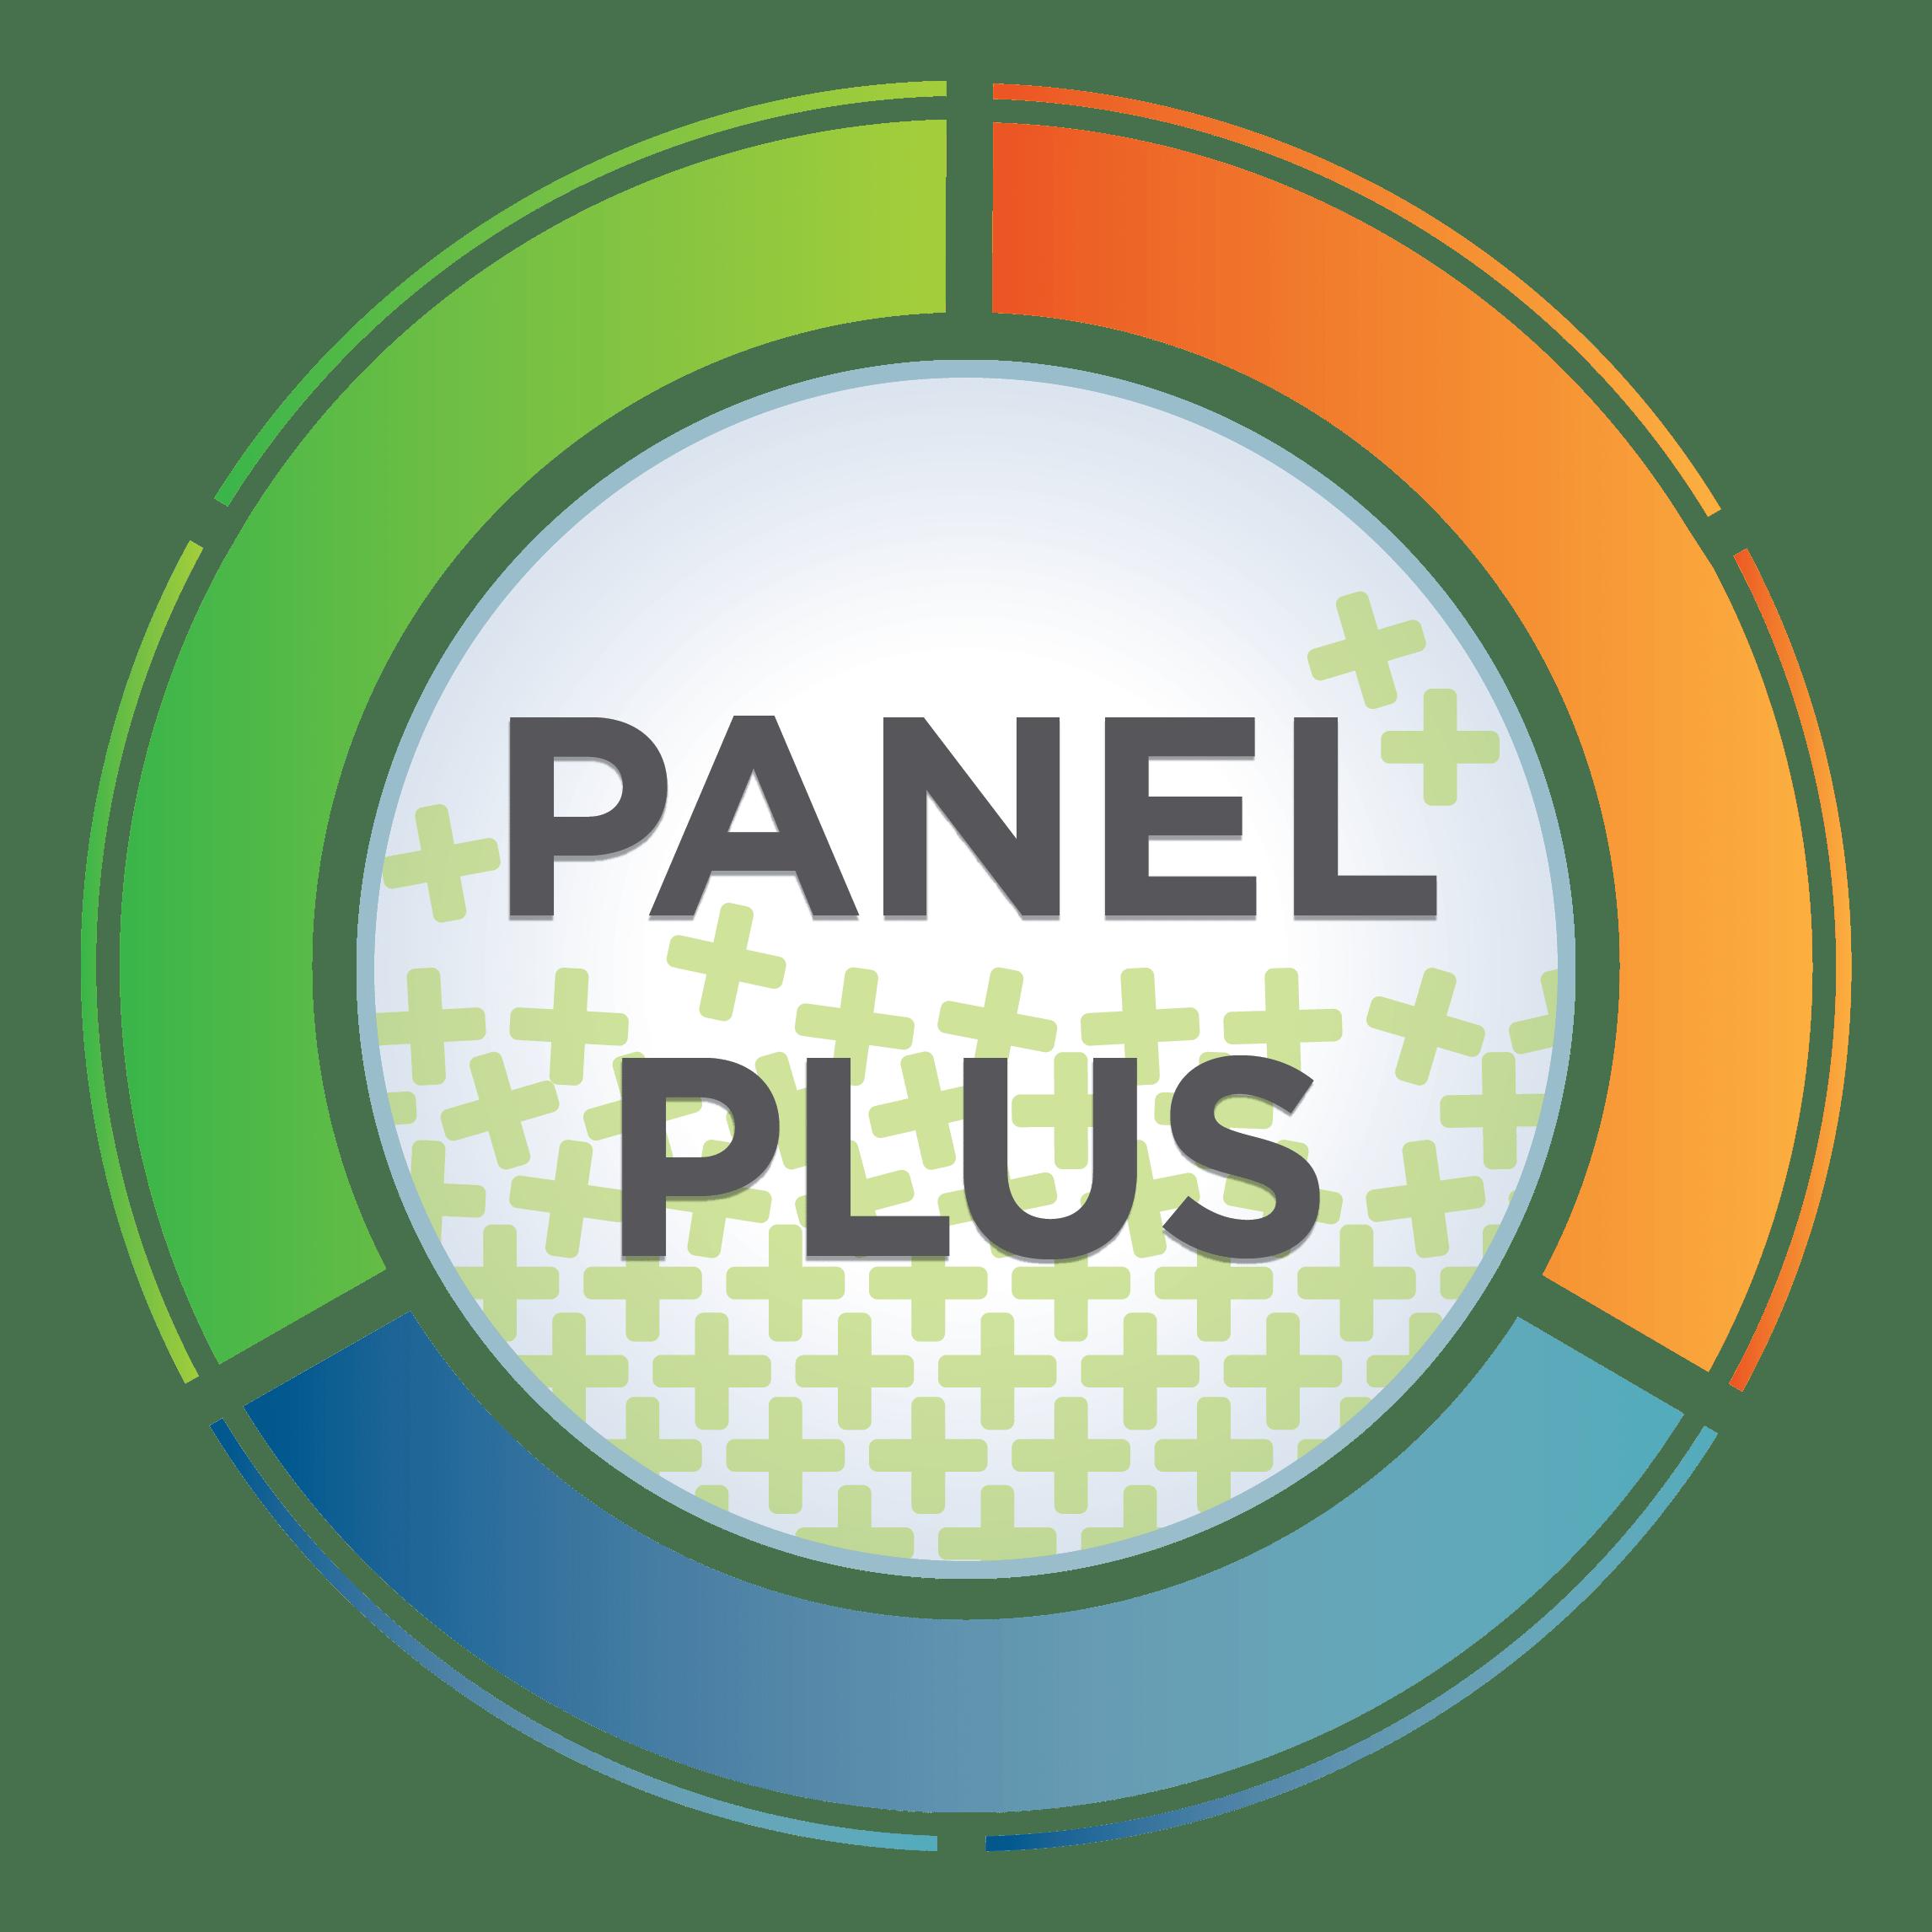 IM_MK2497_Panel Plus Wheel_FINAL